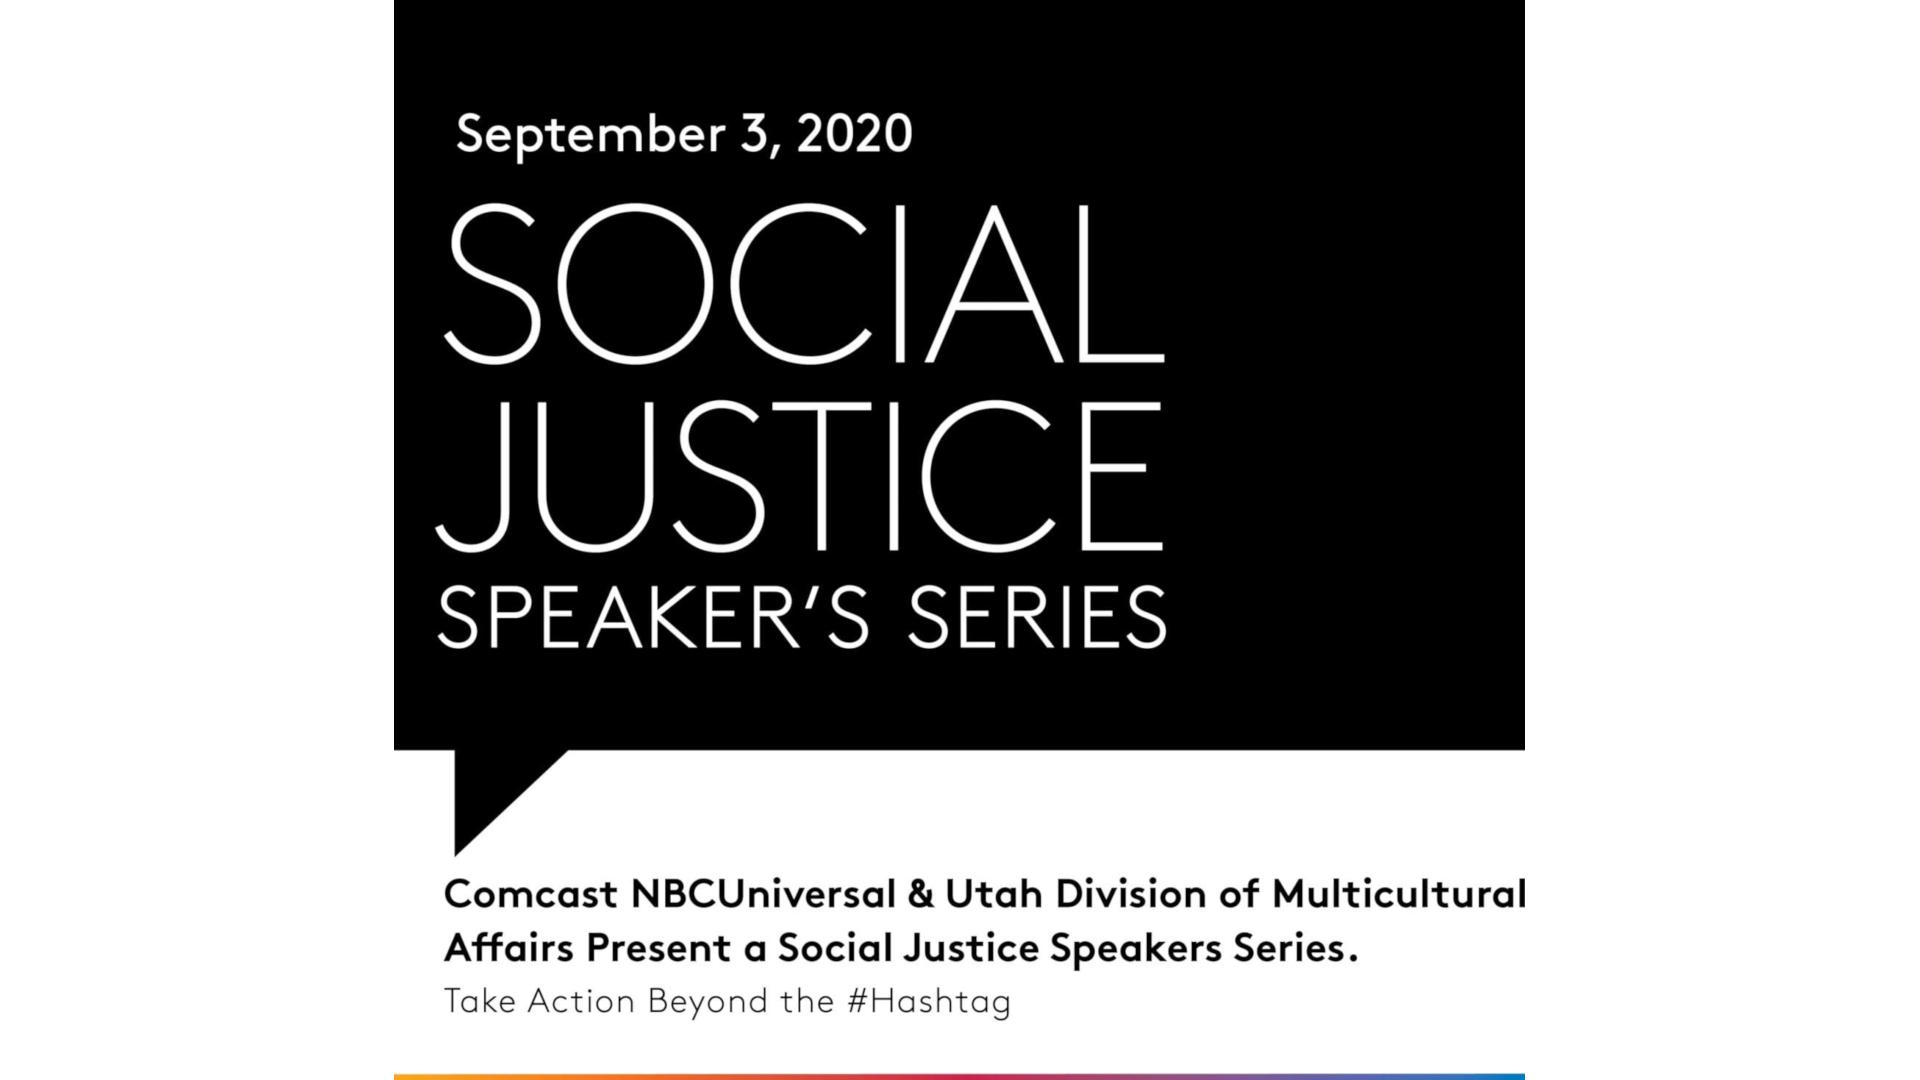 Social Justice Speakers Series poster.